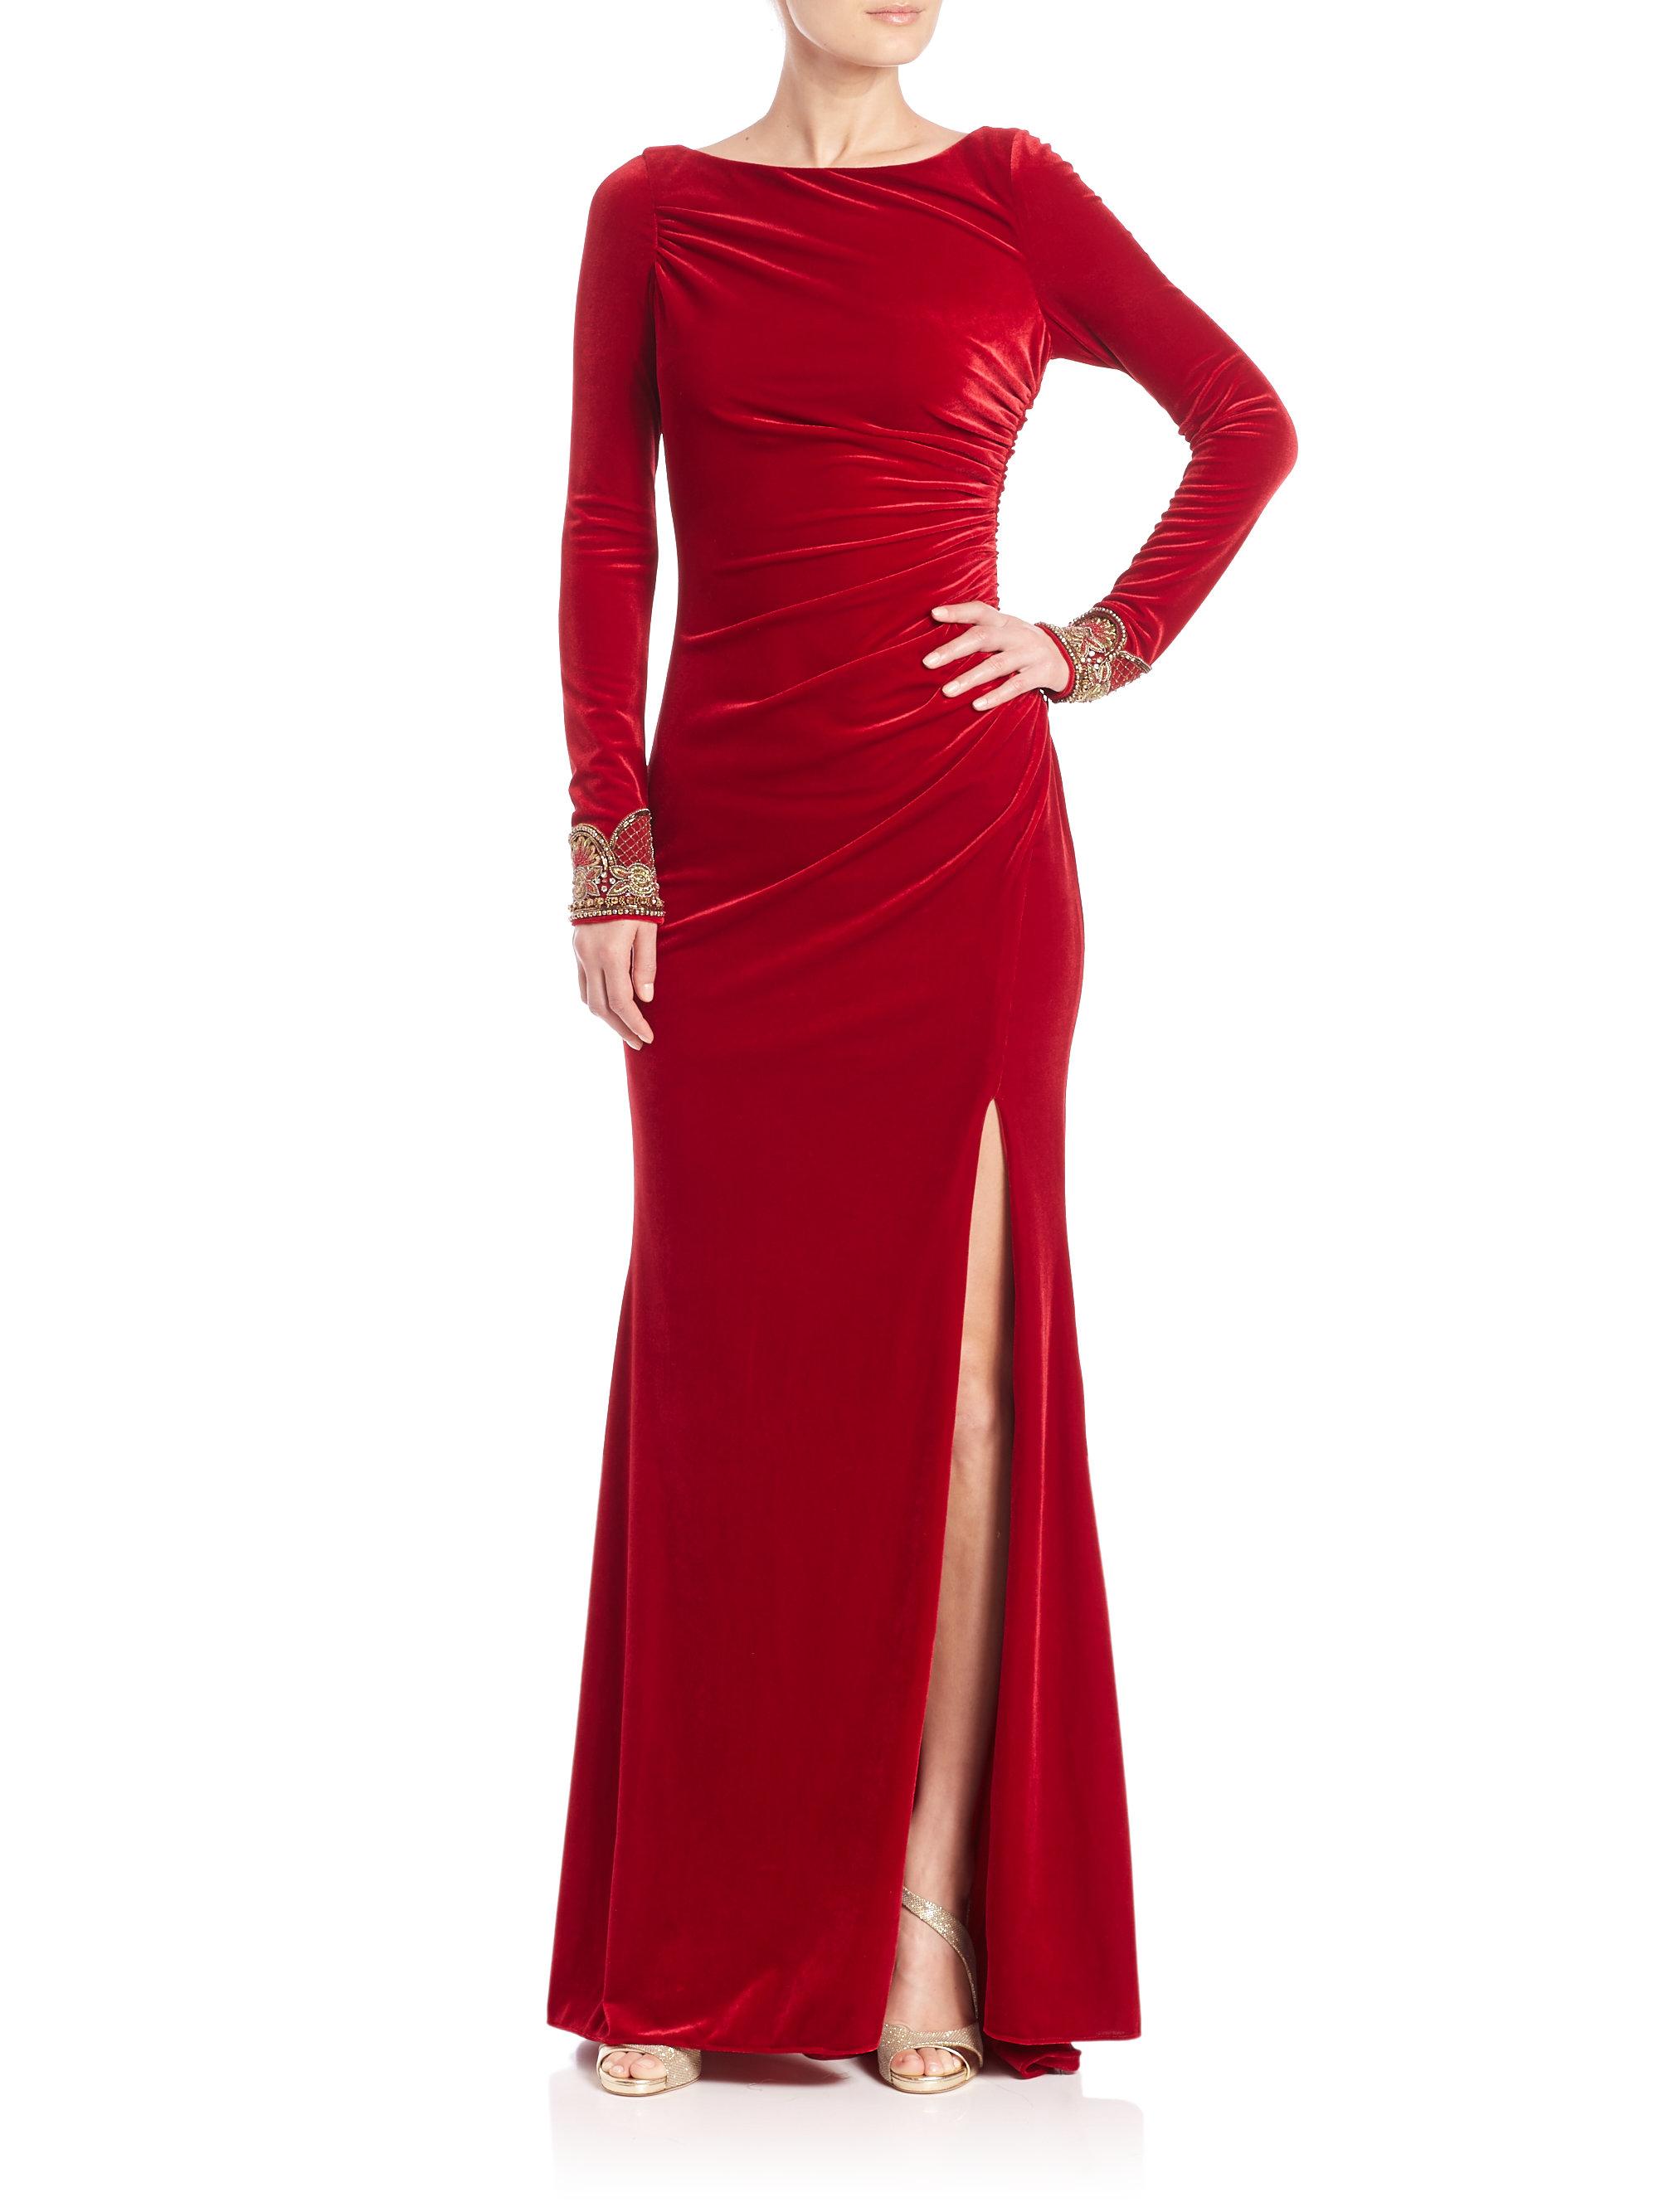 Lyst Badgley Mischka Embellished Velvet Gown In Red